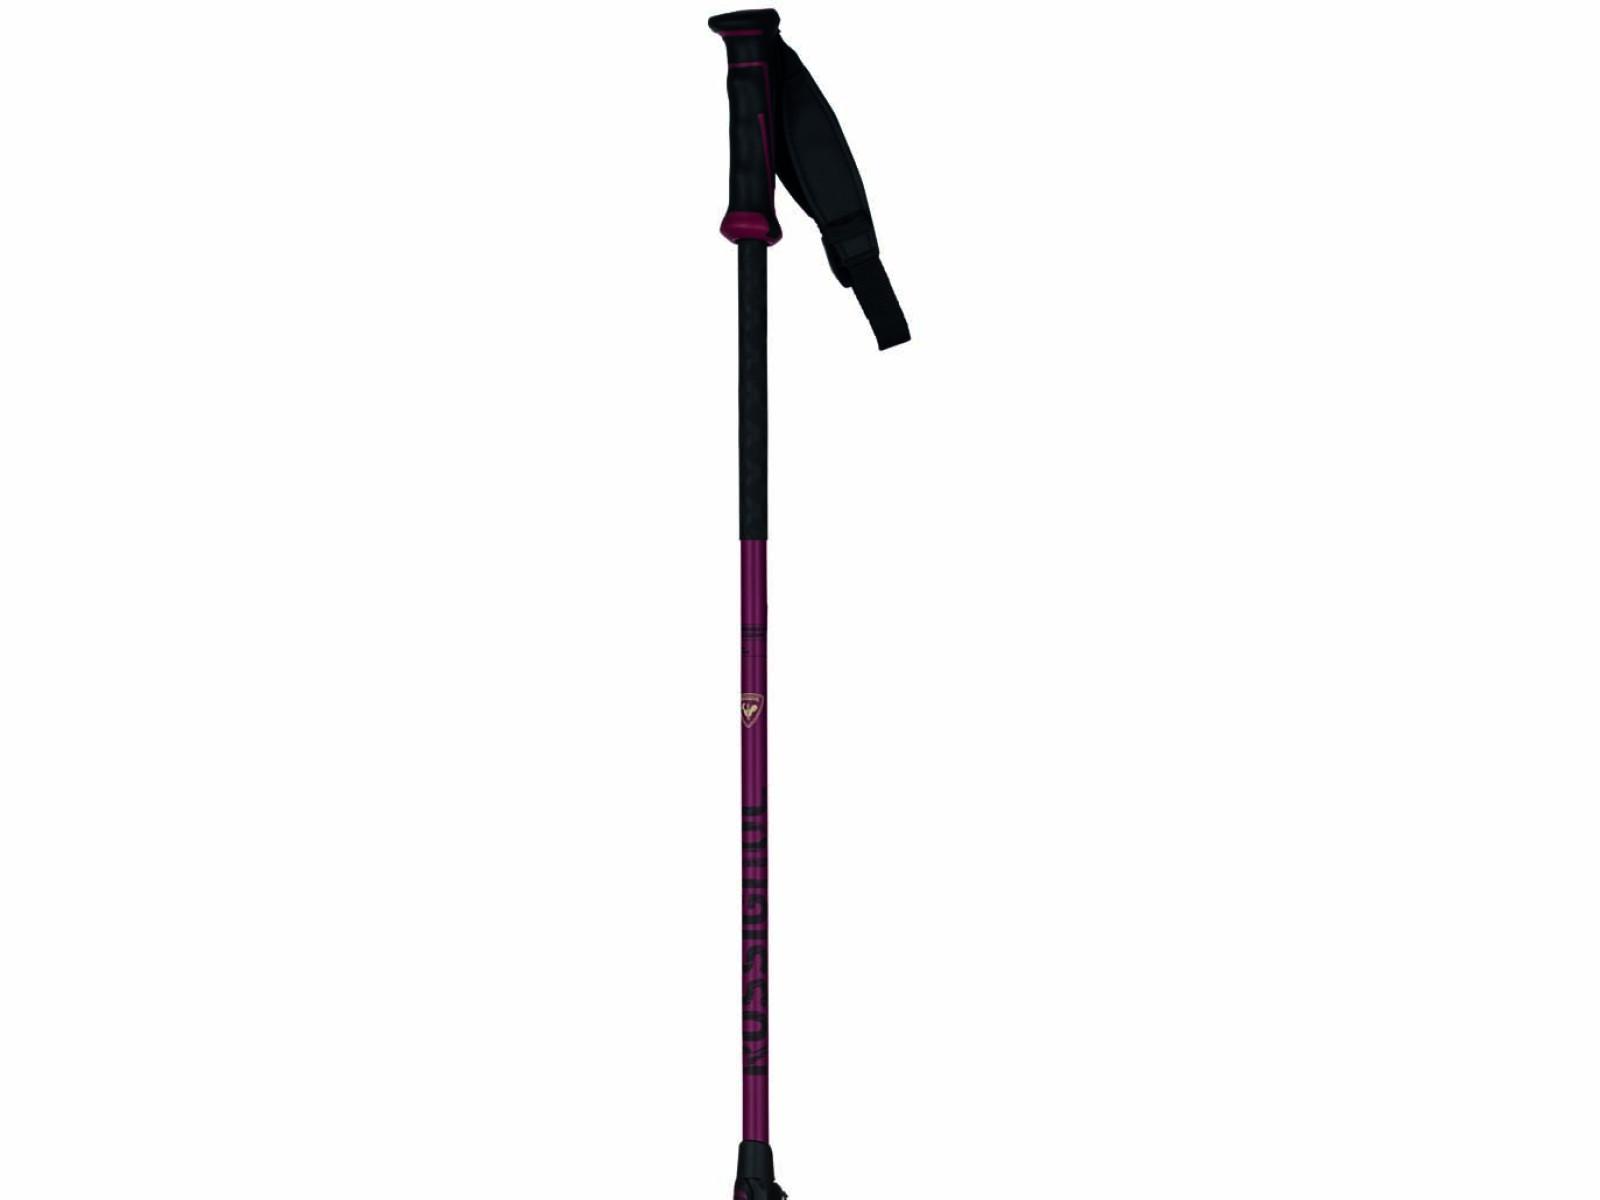 Rossignol Freeride Pro Telescopic Safety Délka nastavitelných hůlek: 110-135 cm